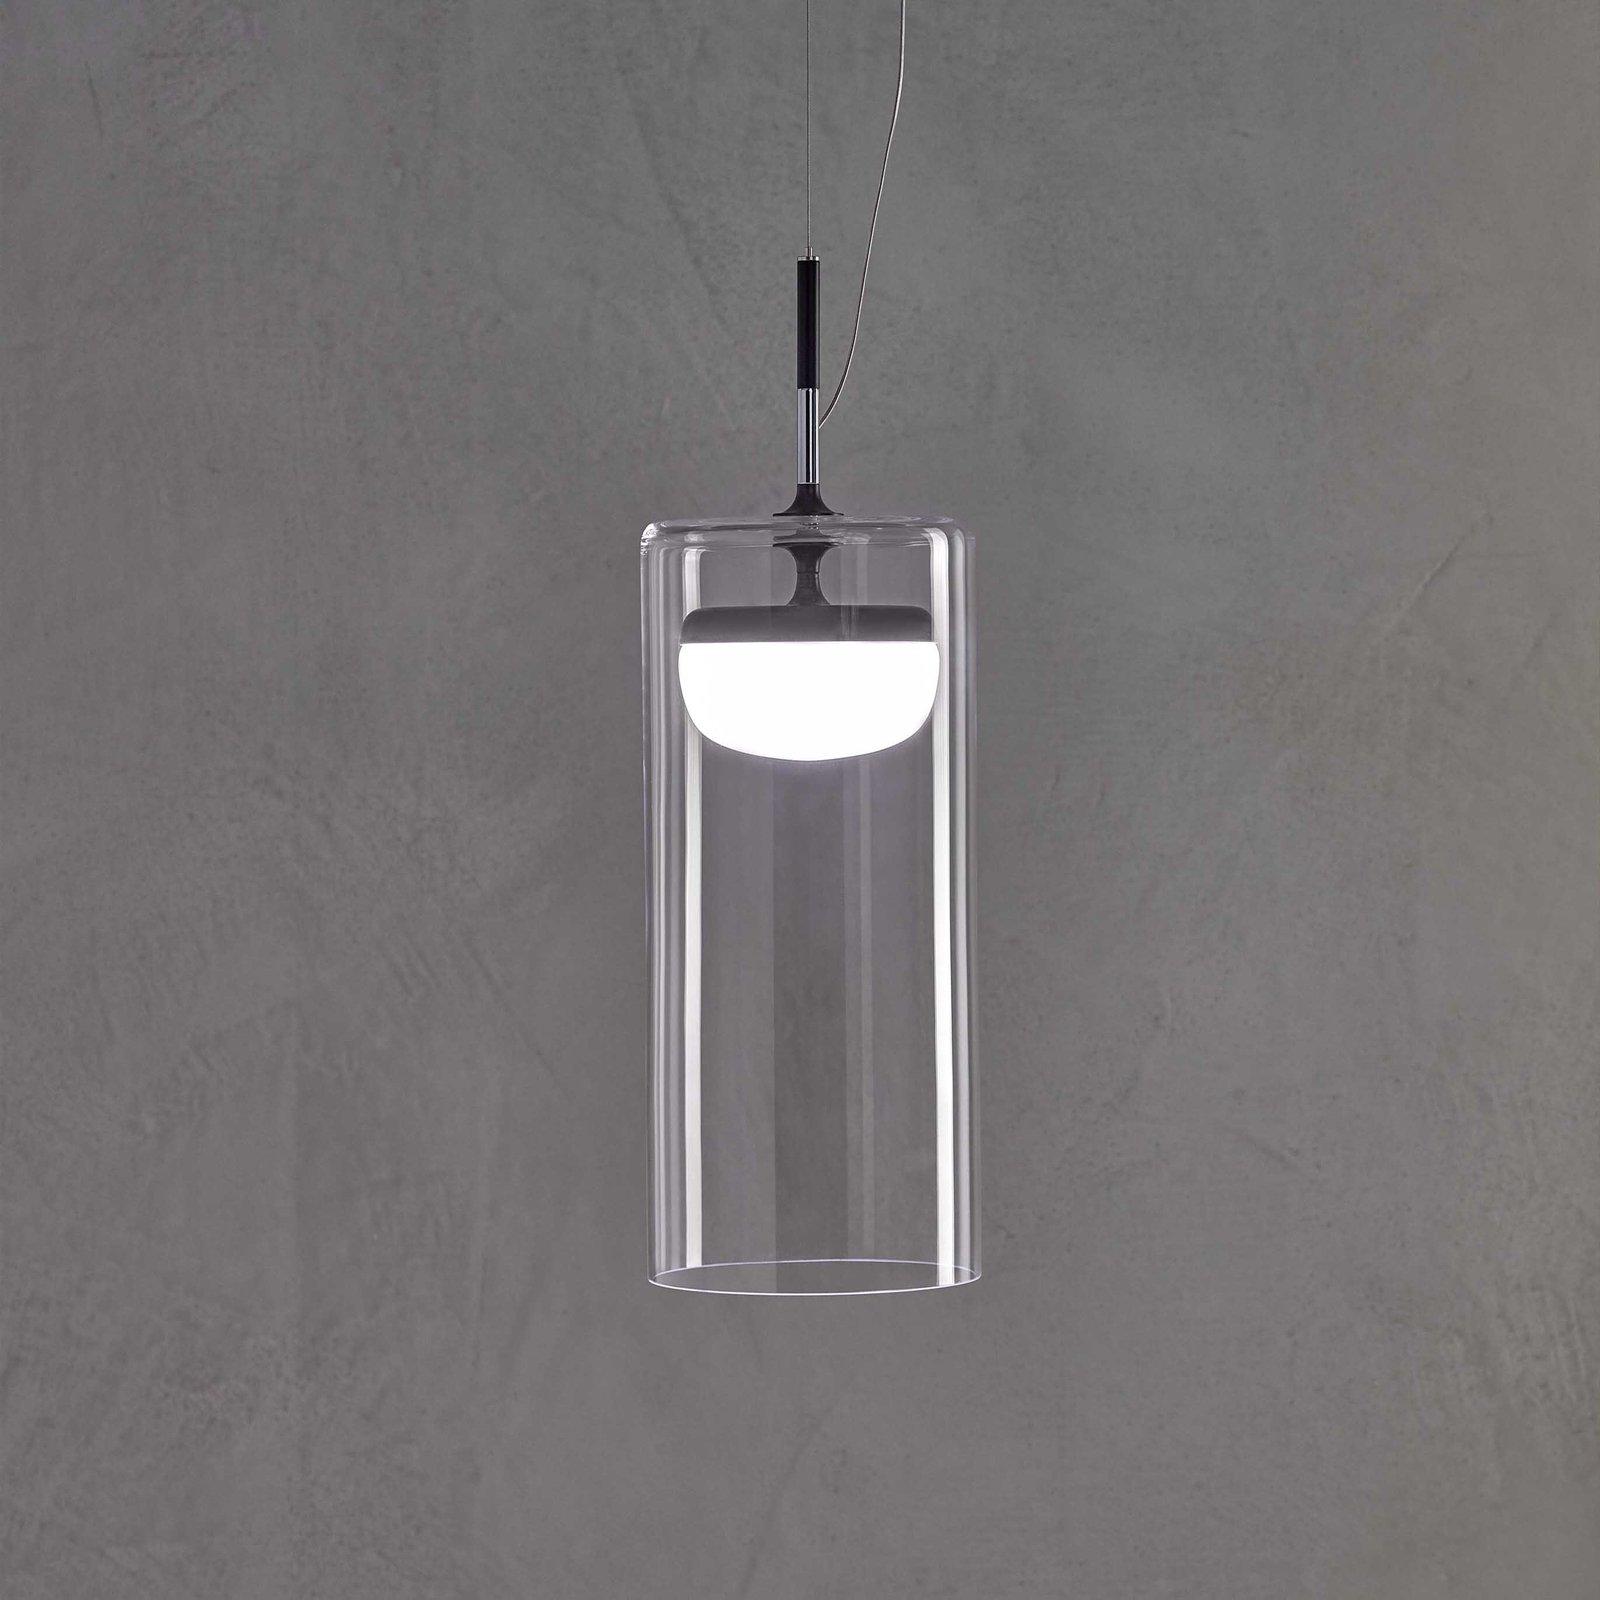 Prandina Diver LED-hengelampe S5 2 700 K svart